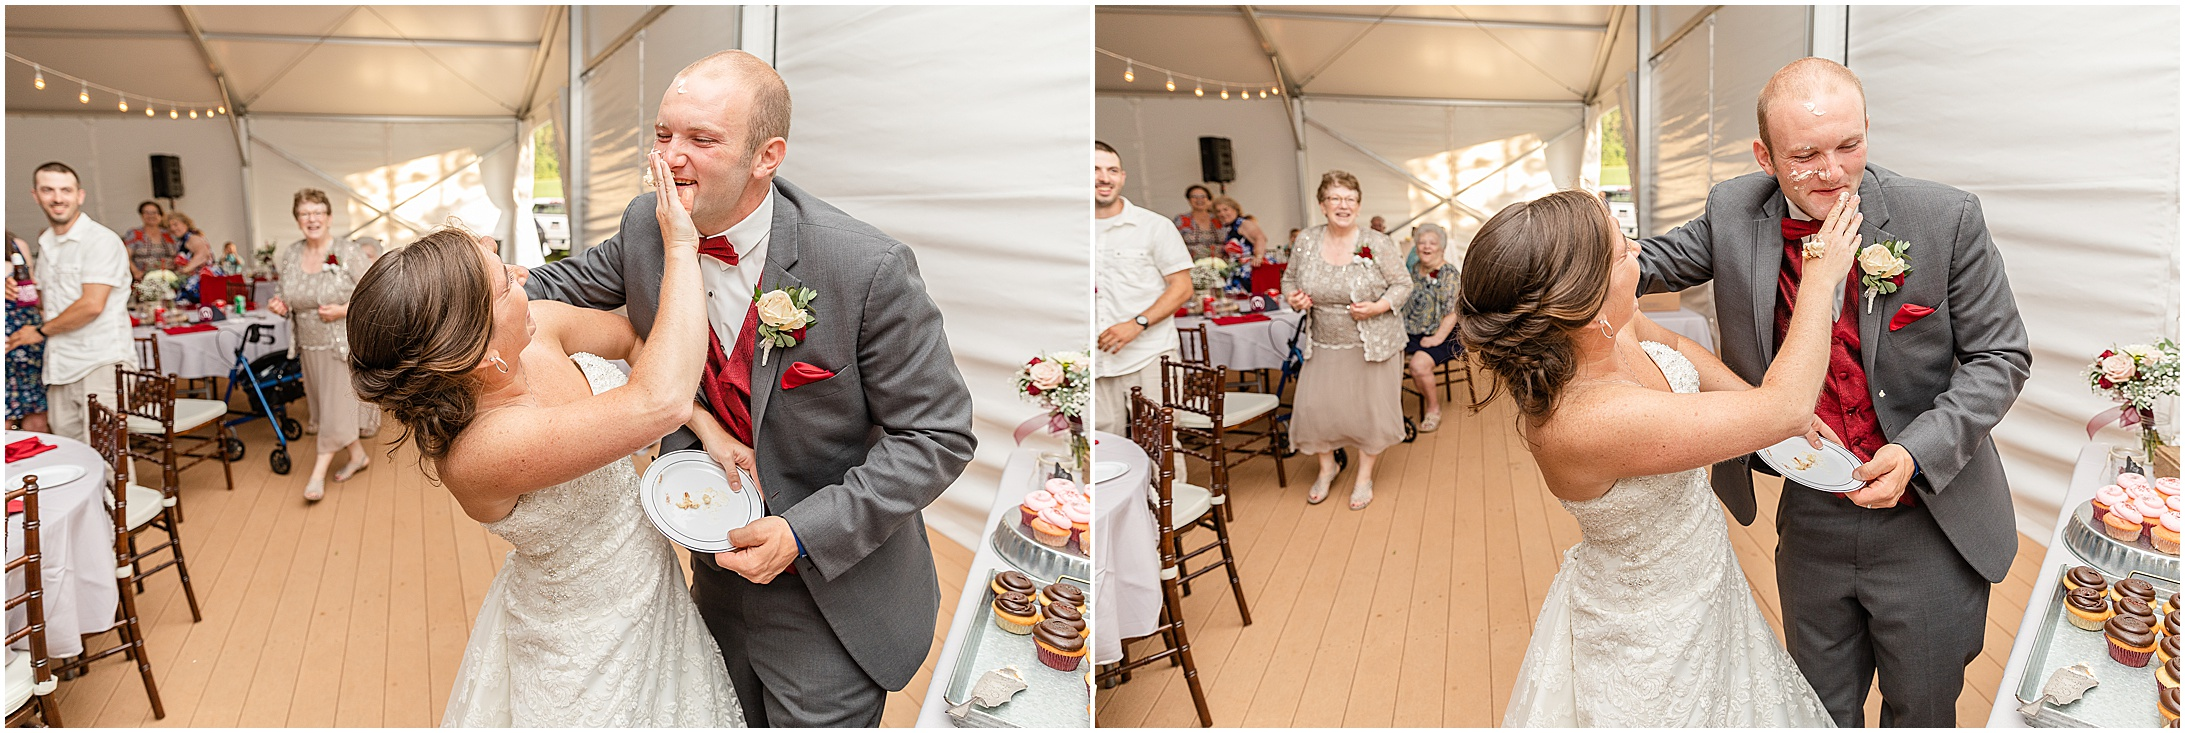 The-Royer-House-Wedding-Photos_0446.jpg